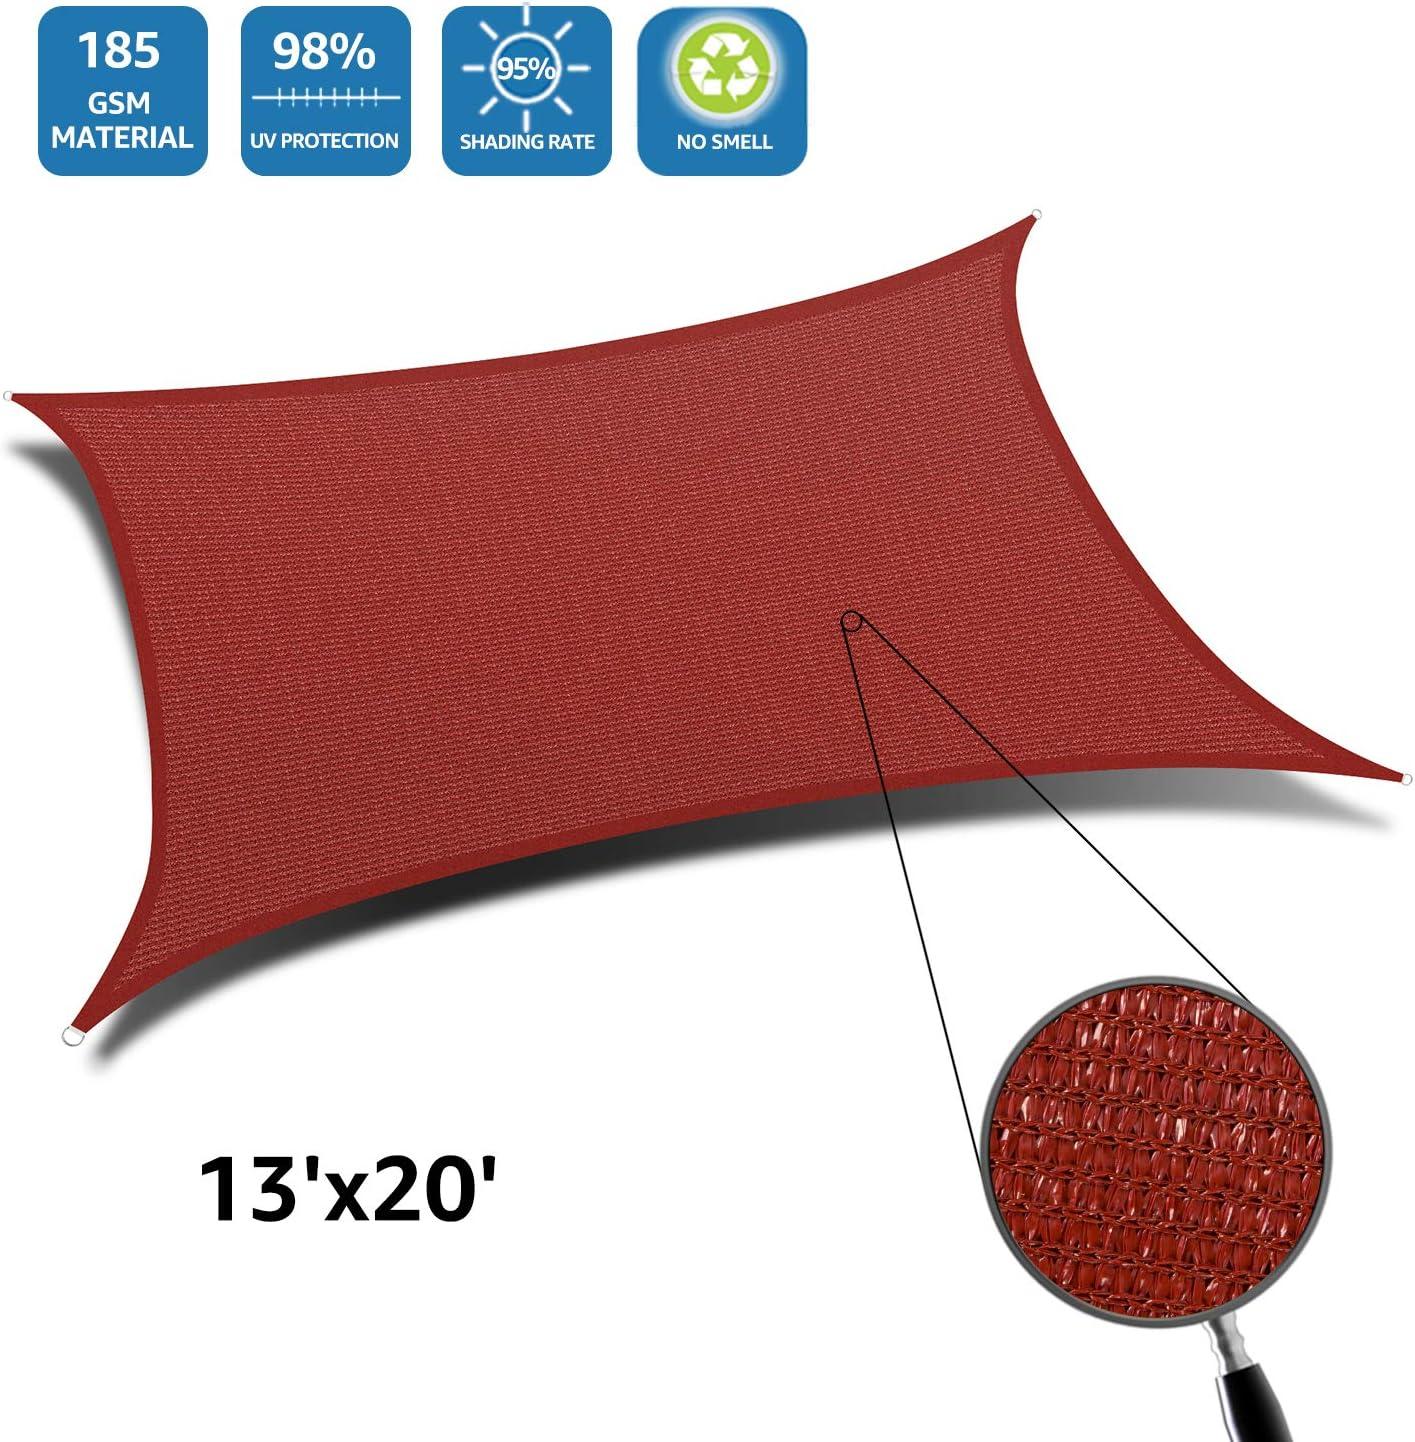 Terra DOEWORKS Rectangle 13 X 20 Sun Shade Sail UV Block for Outdoor Patio Garden Facility and Activities